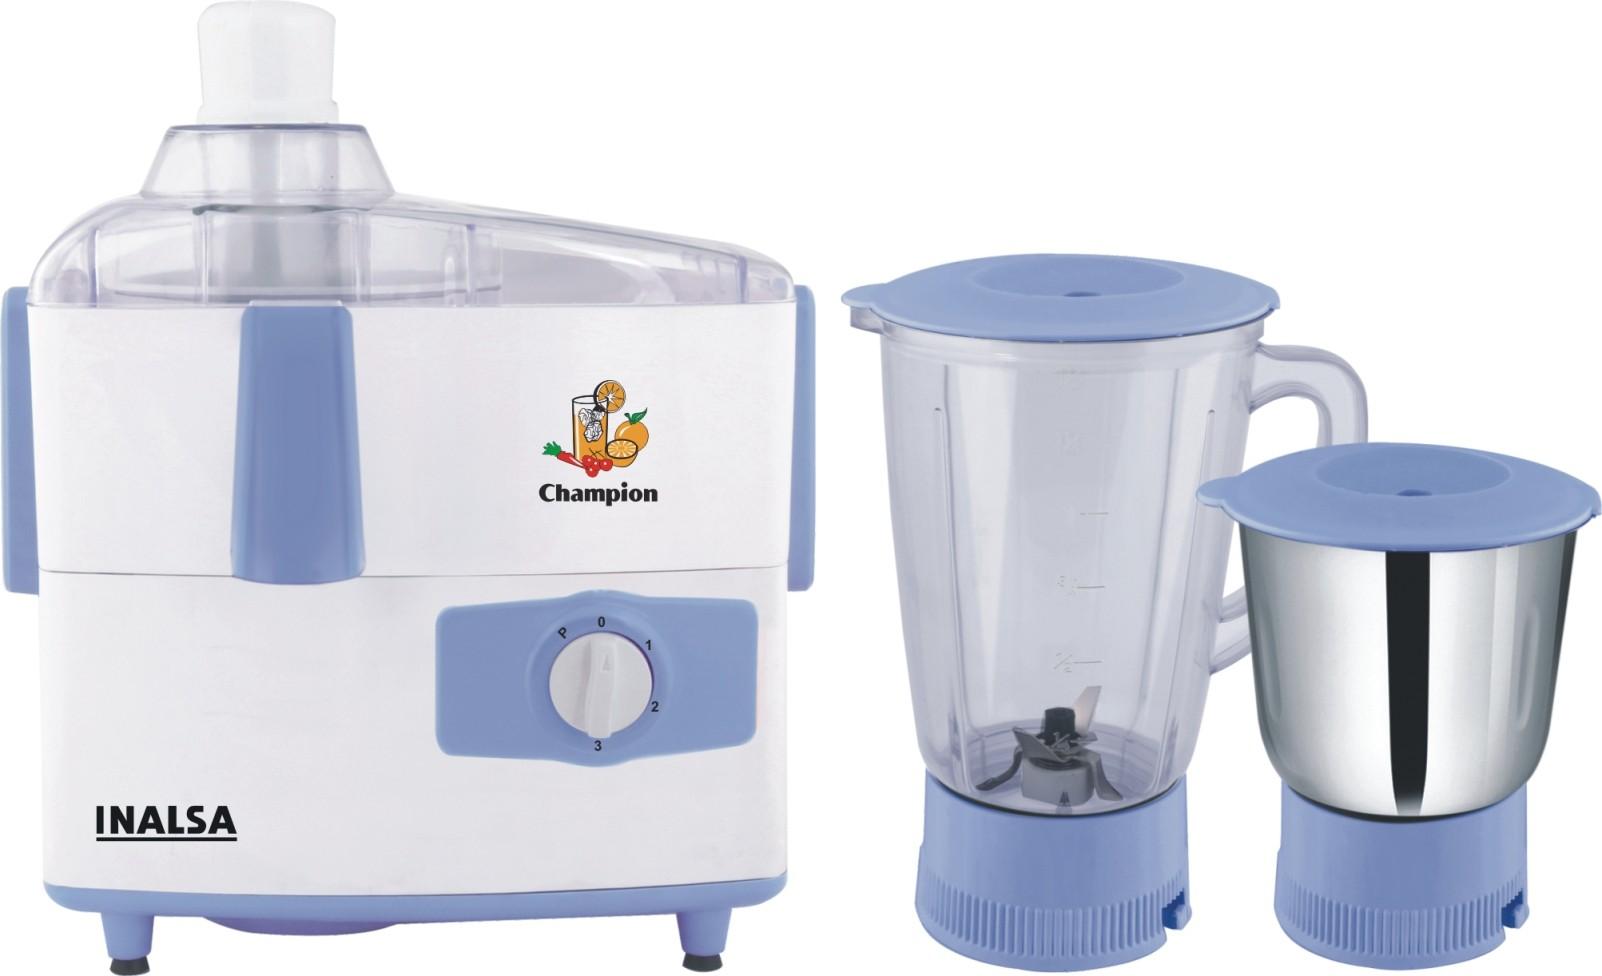 Inalsa Champion JMG 450 W Juicer Mixer Grinder(White, Blue, 2 Jars)